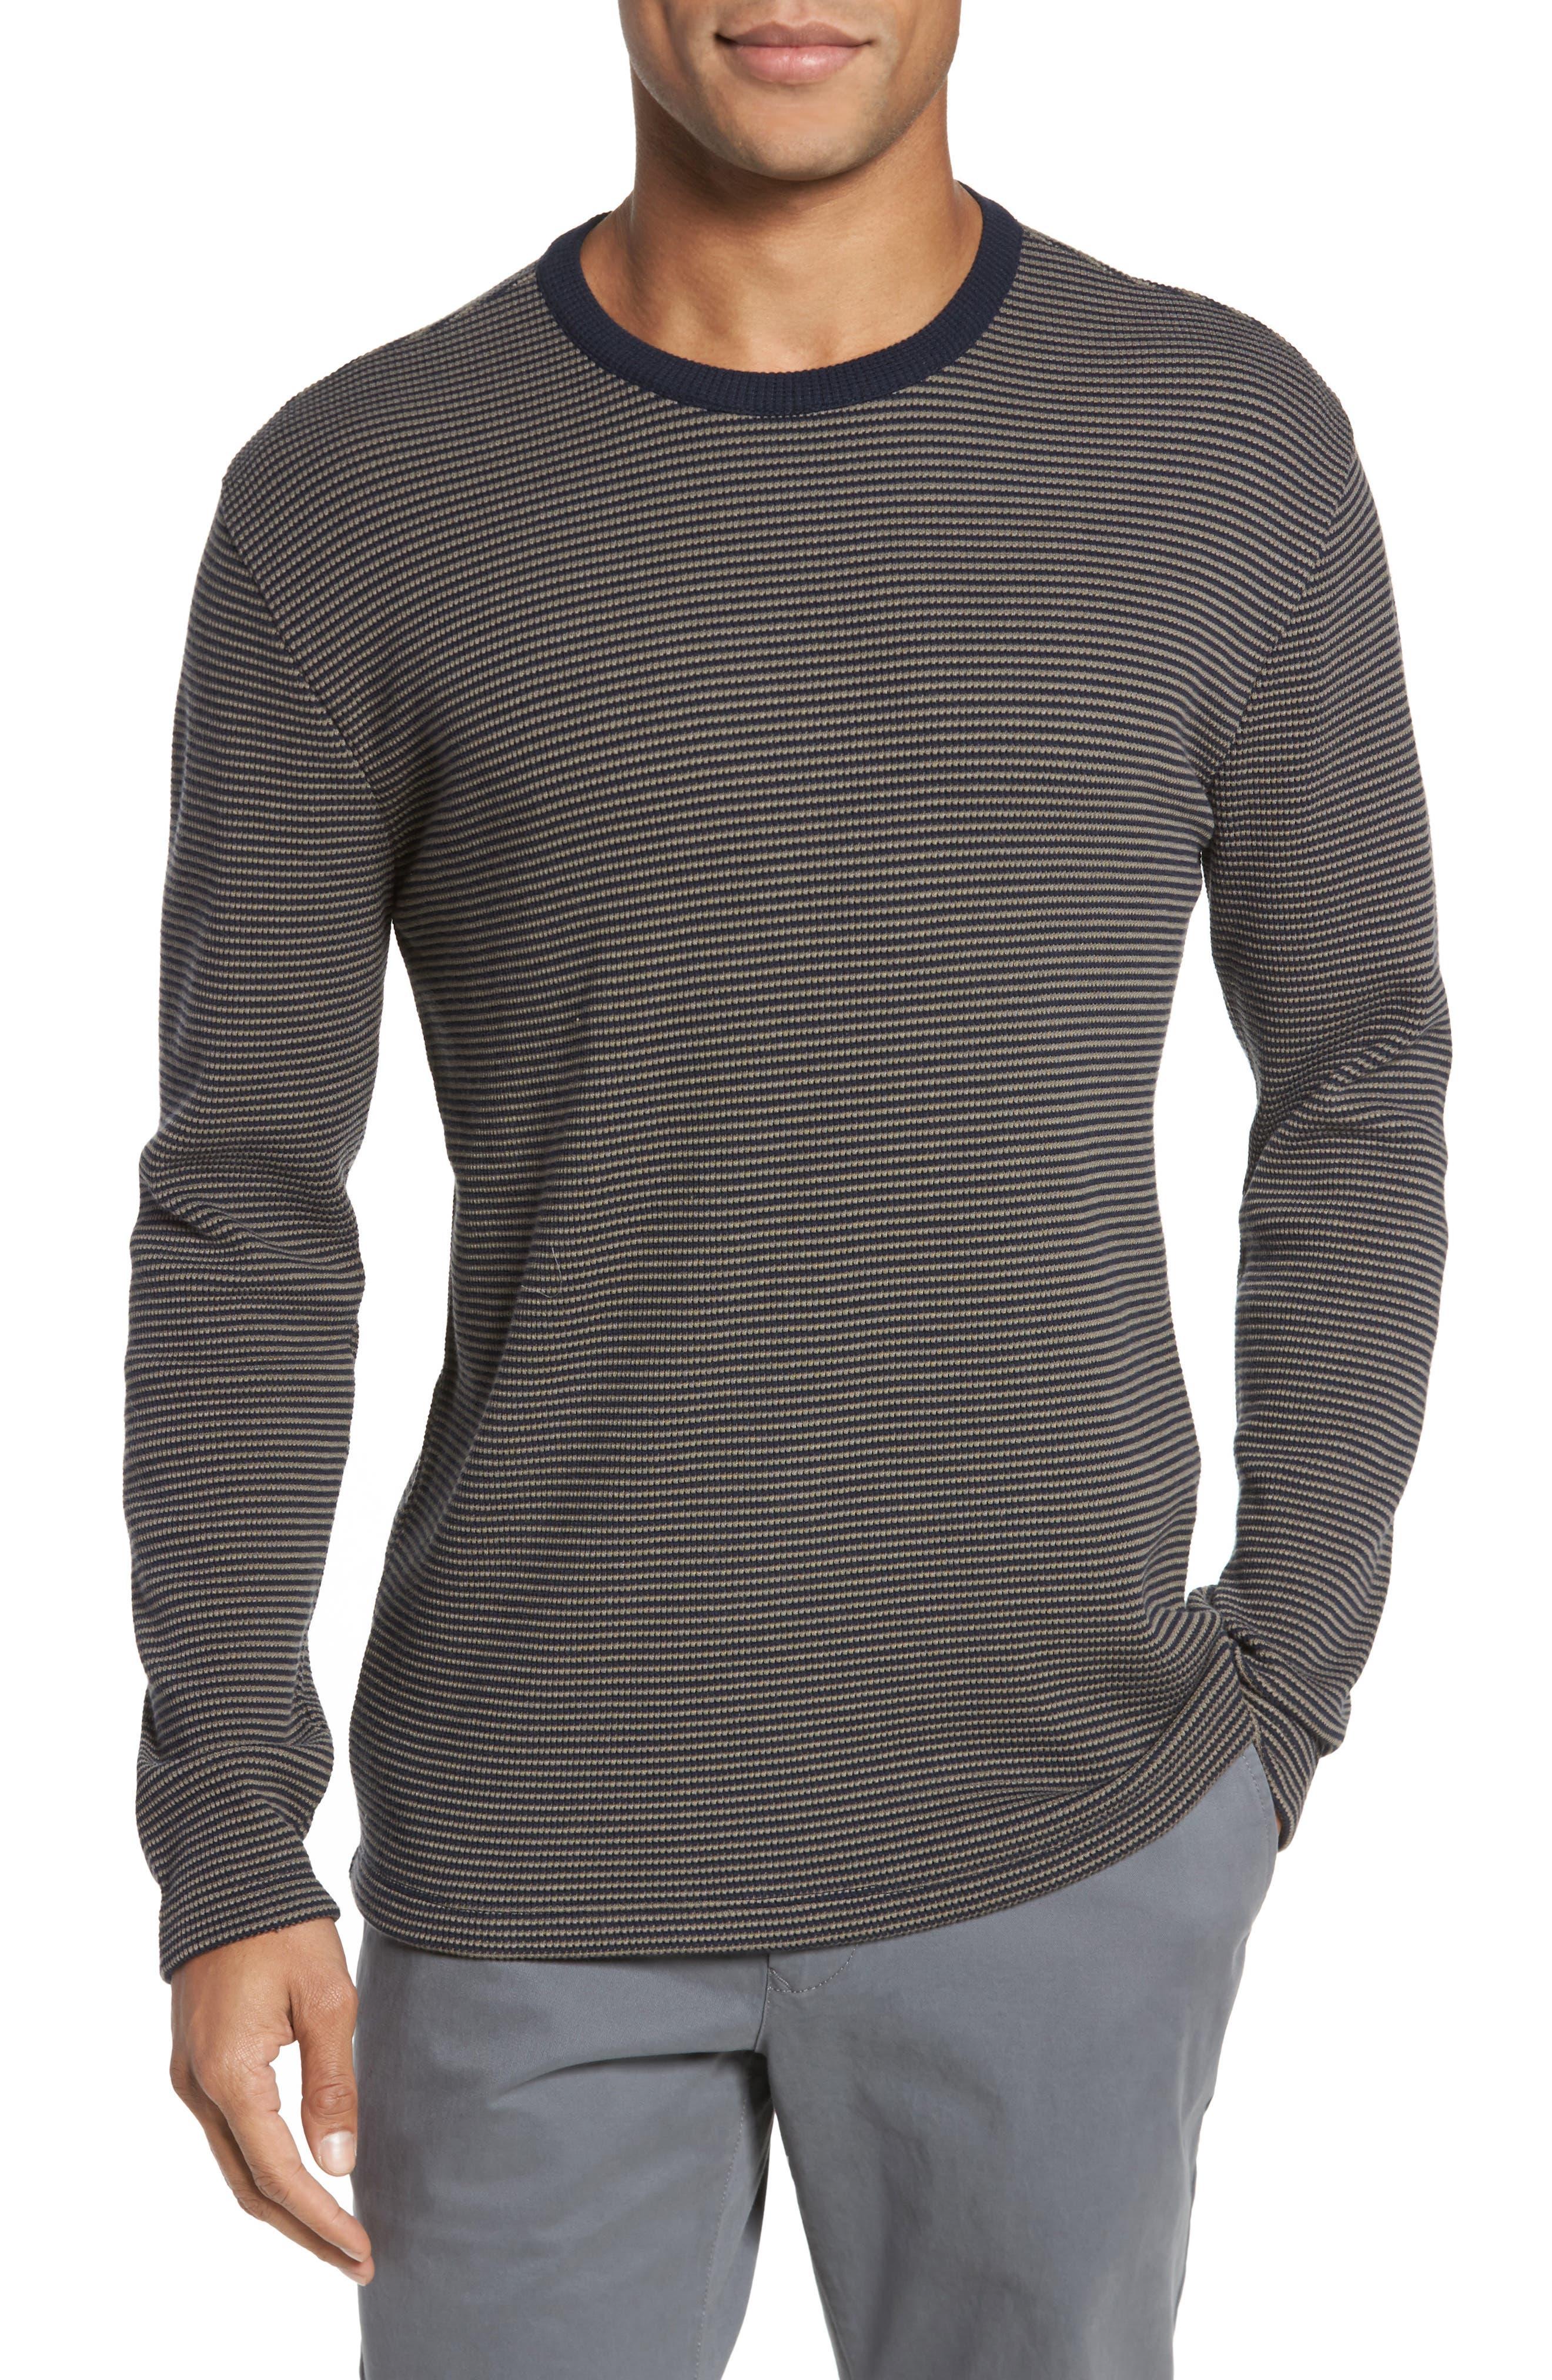 Main Image - Bonobos Slim Fit Waffle Knit T-Shirt